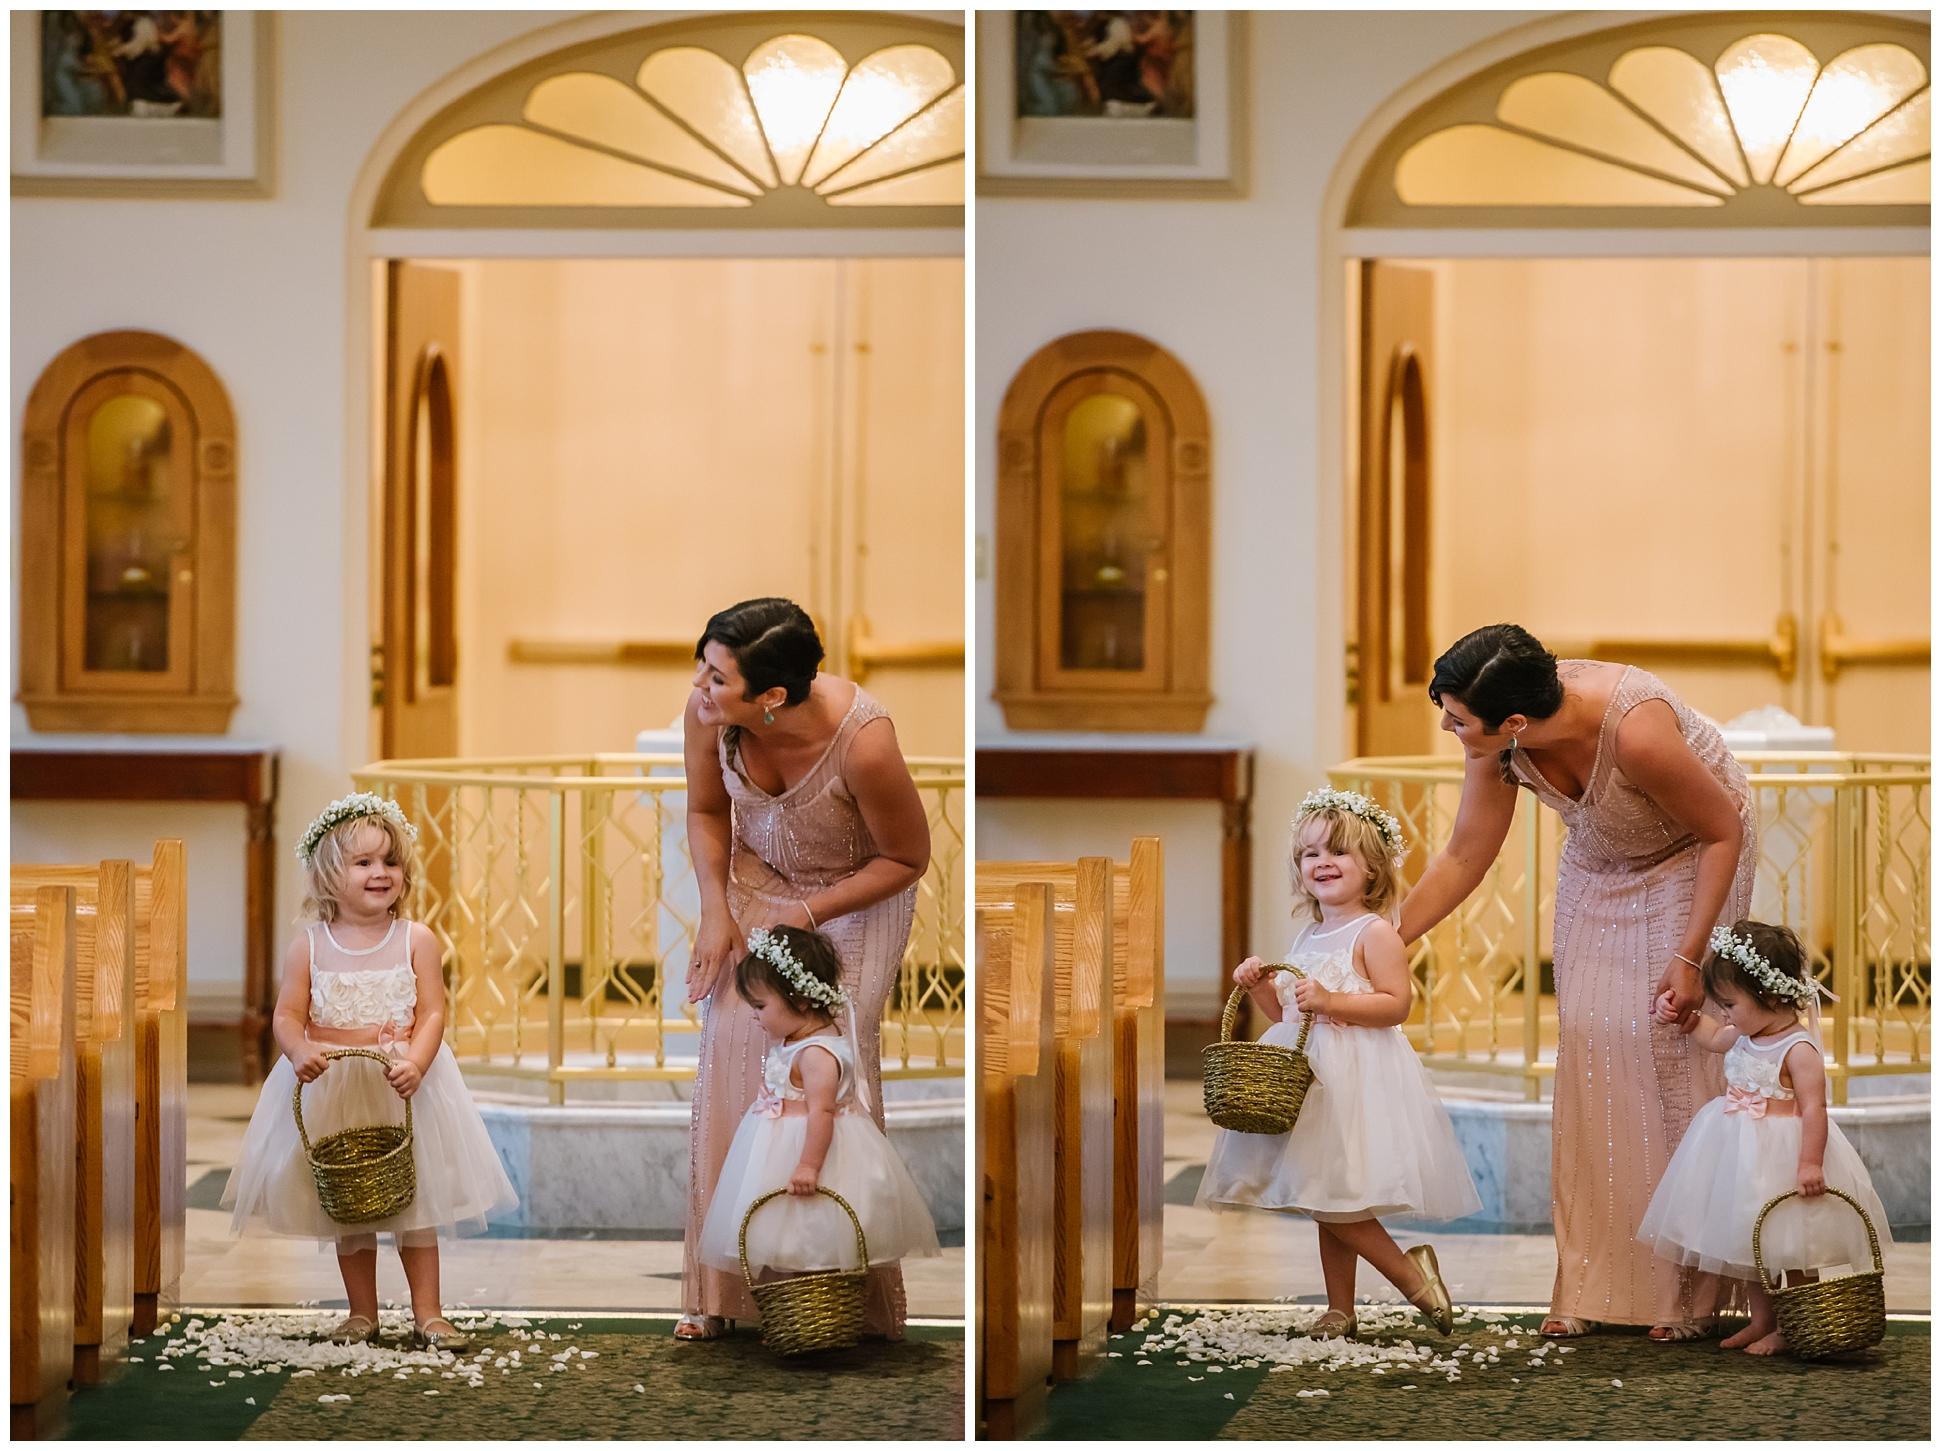 st-pete-wedding-photographer-italian-romance-theme-rustic-flower-crown_0392.jpg